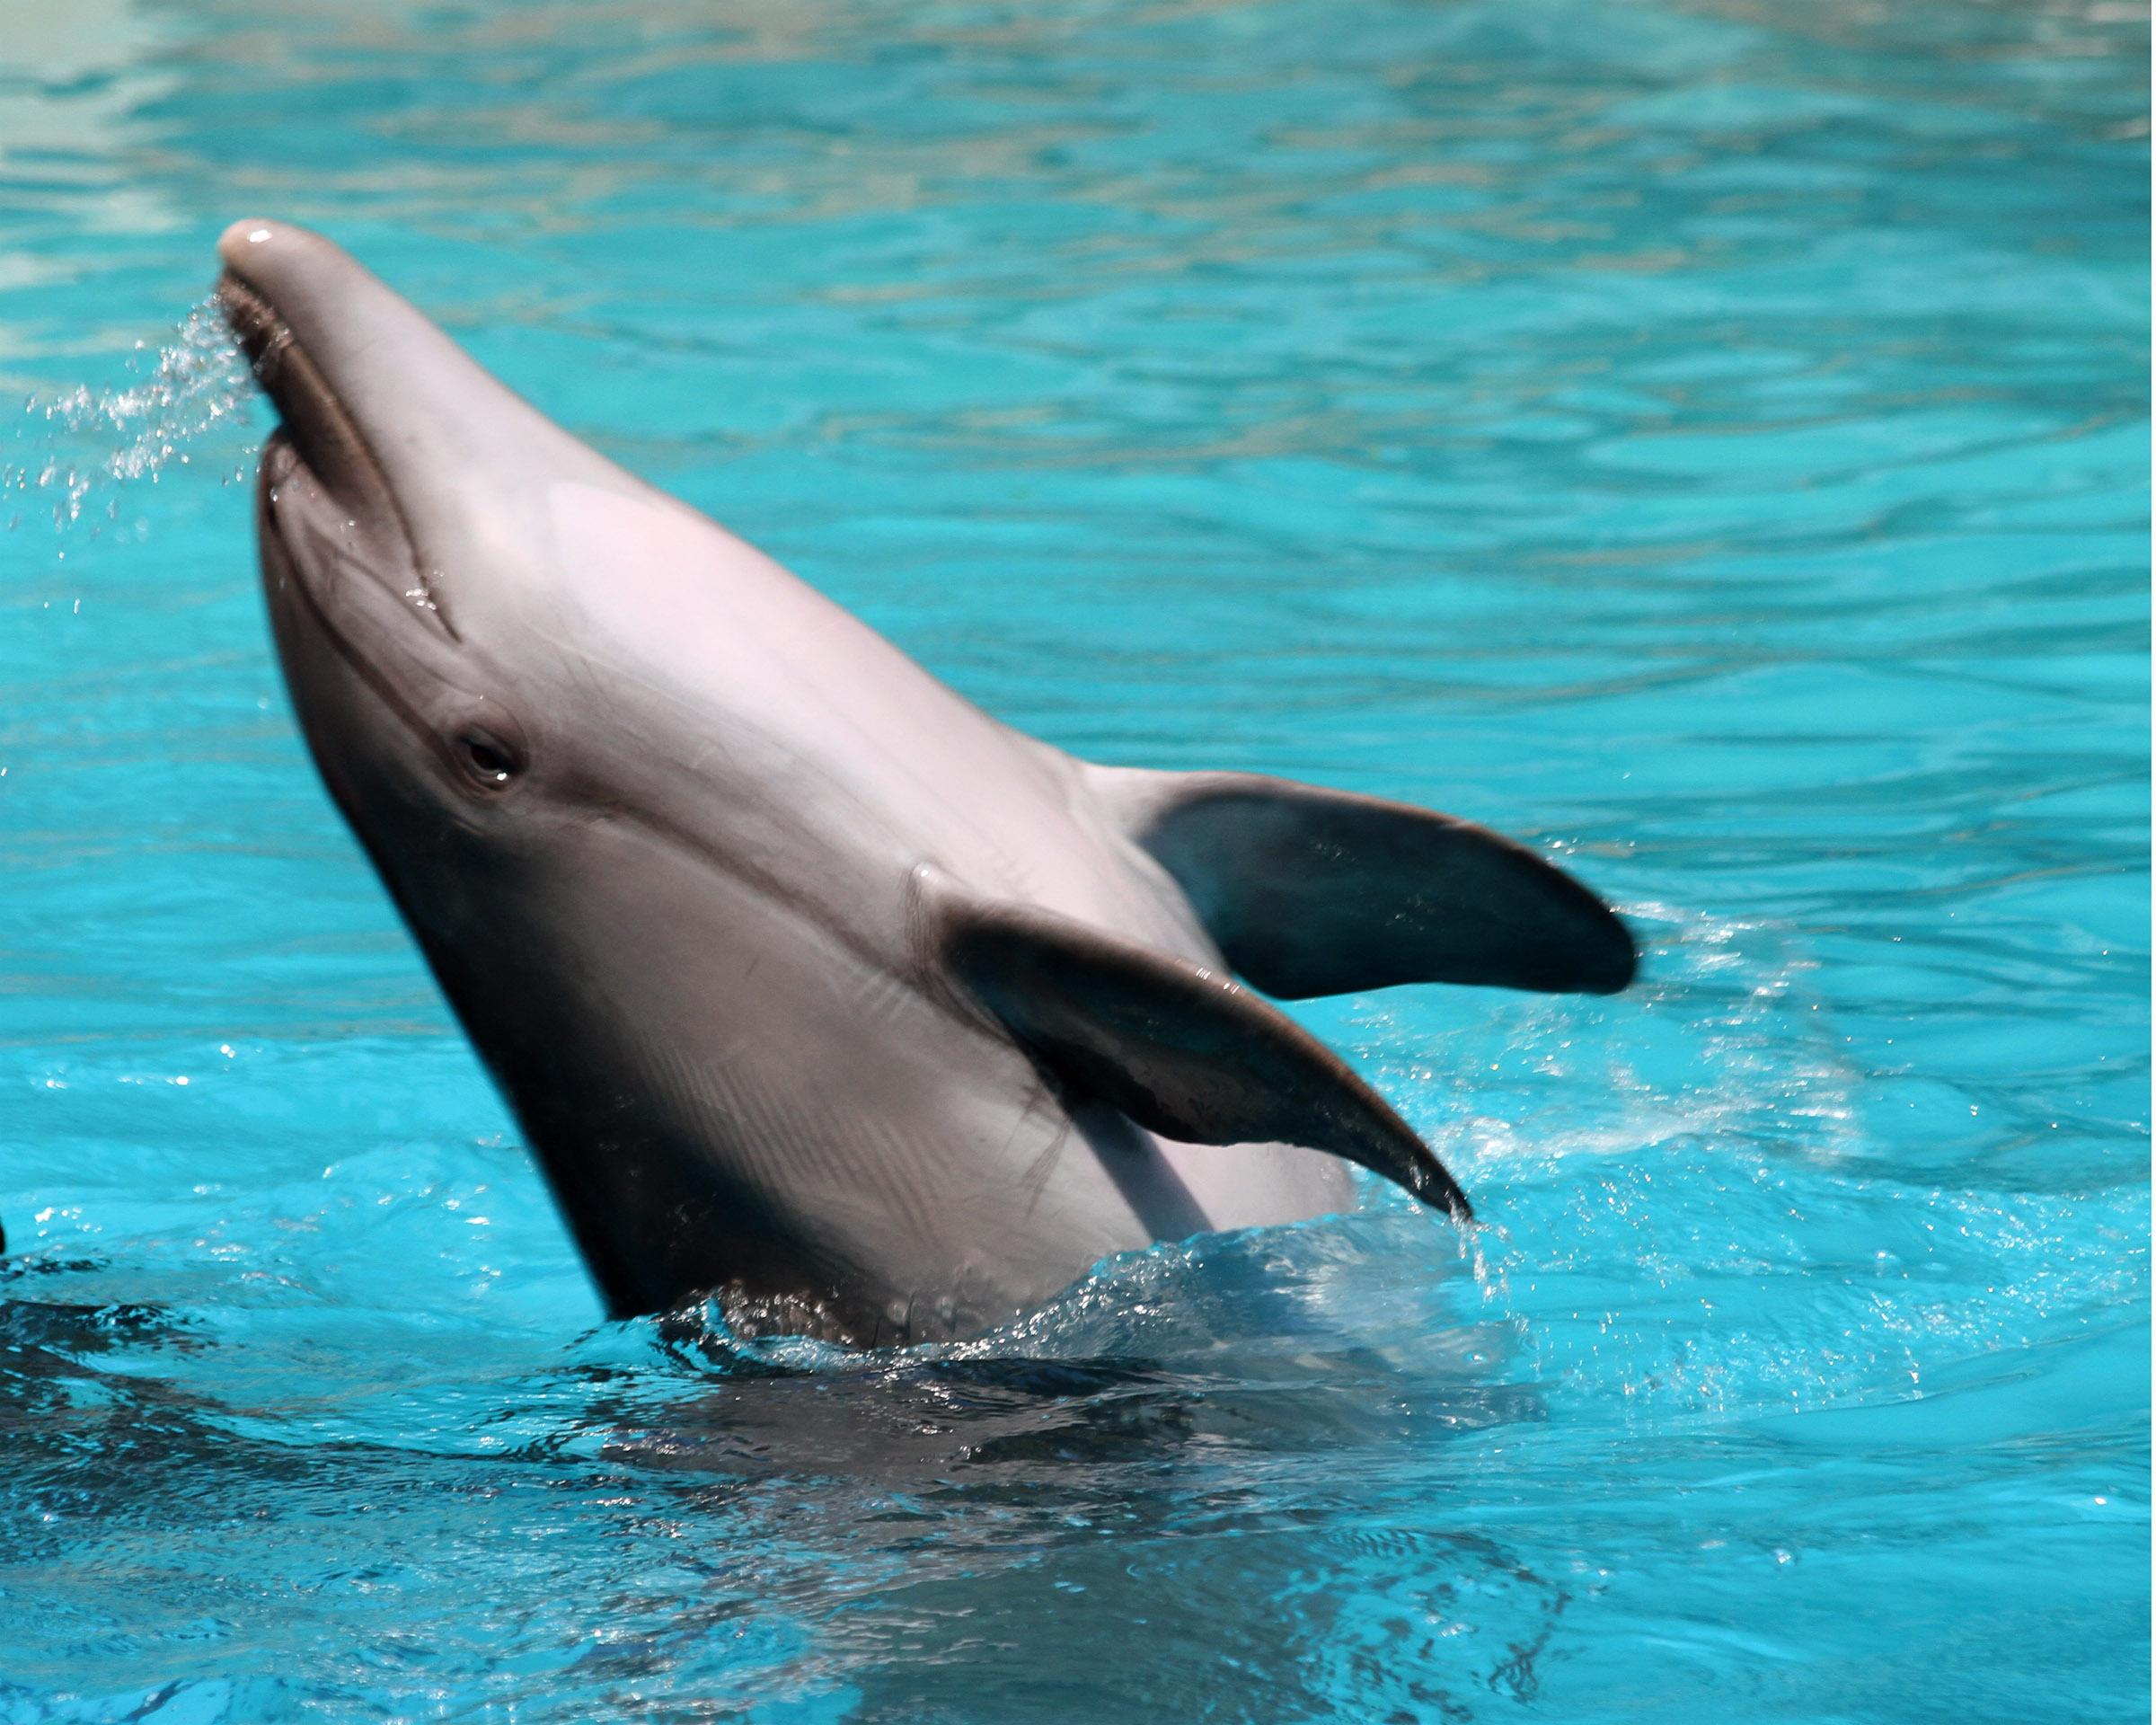 Dolphin, Animal, Underwater, Teeth, Swim, HQ Photo